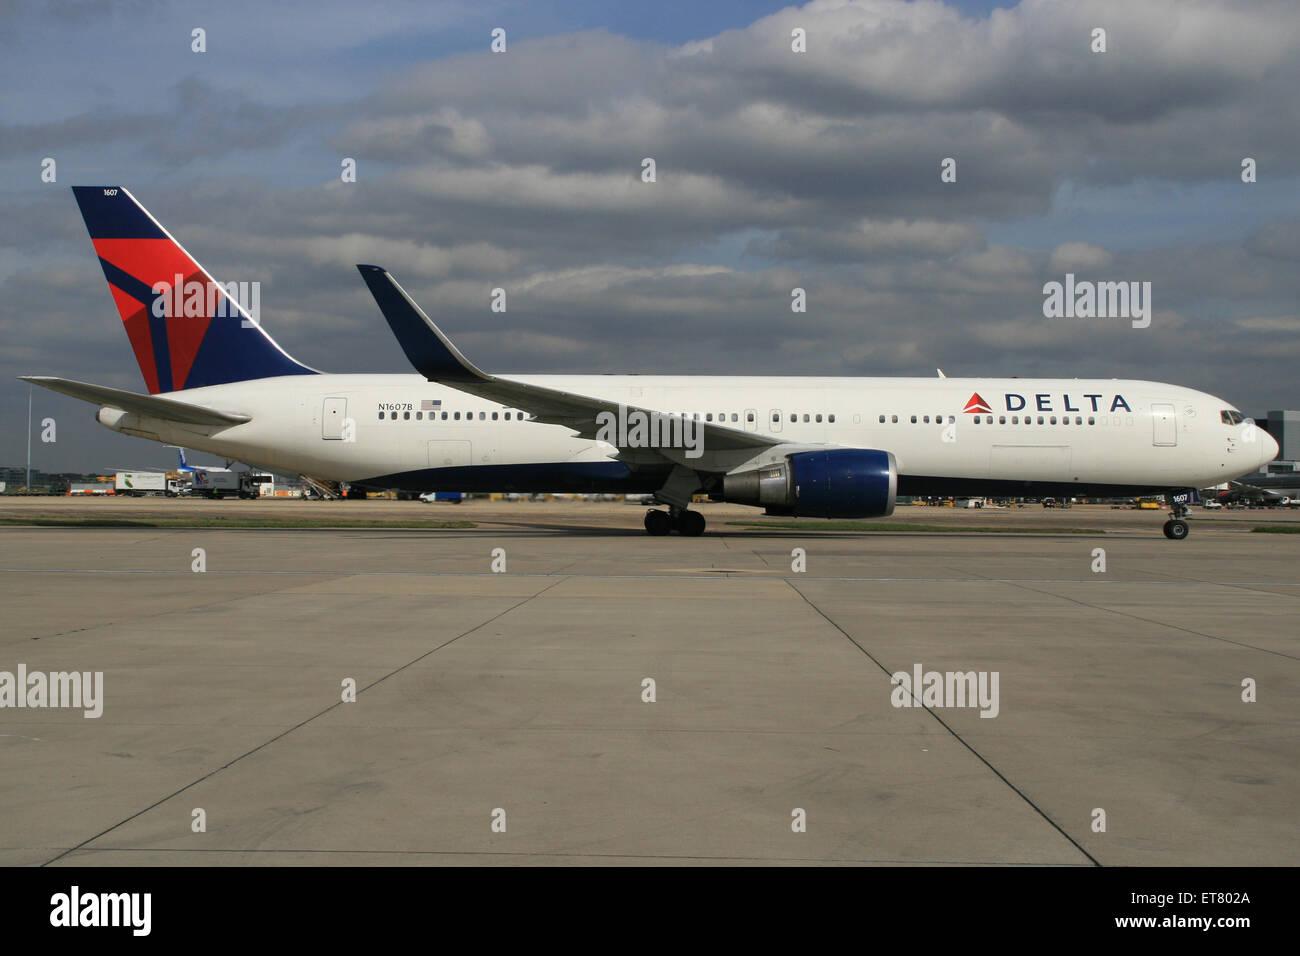 DELTA 767 WINGLETS - Stock Image